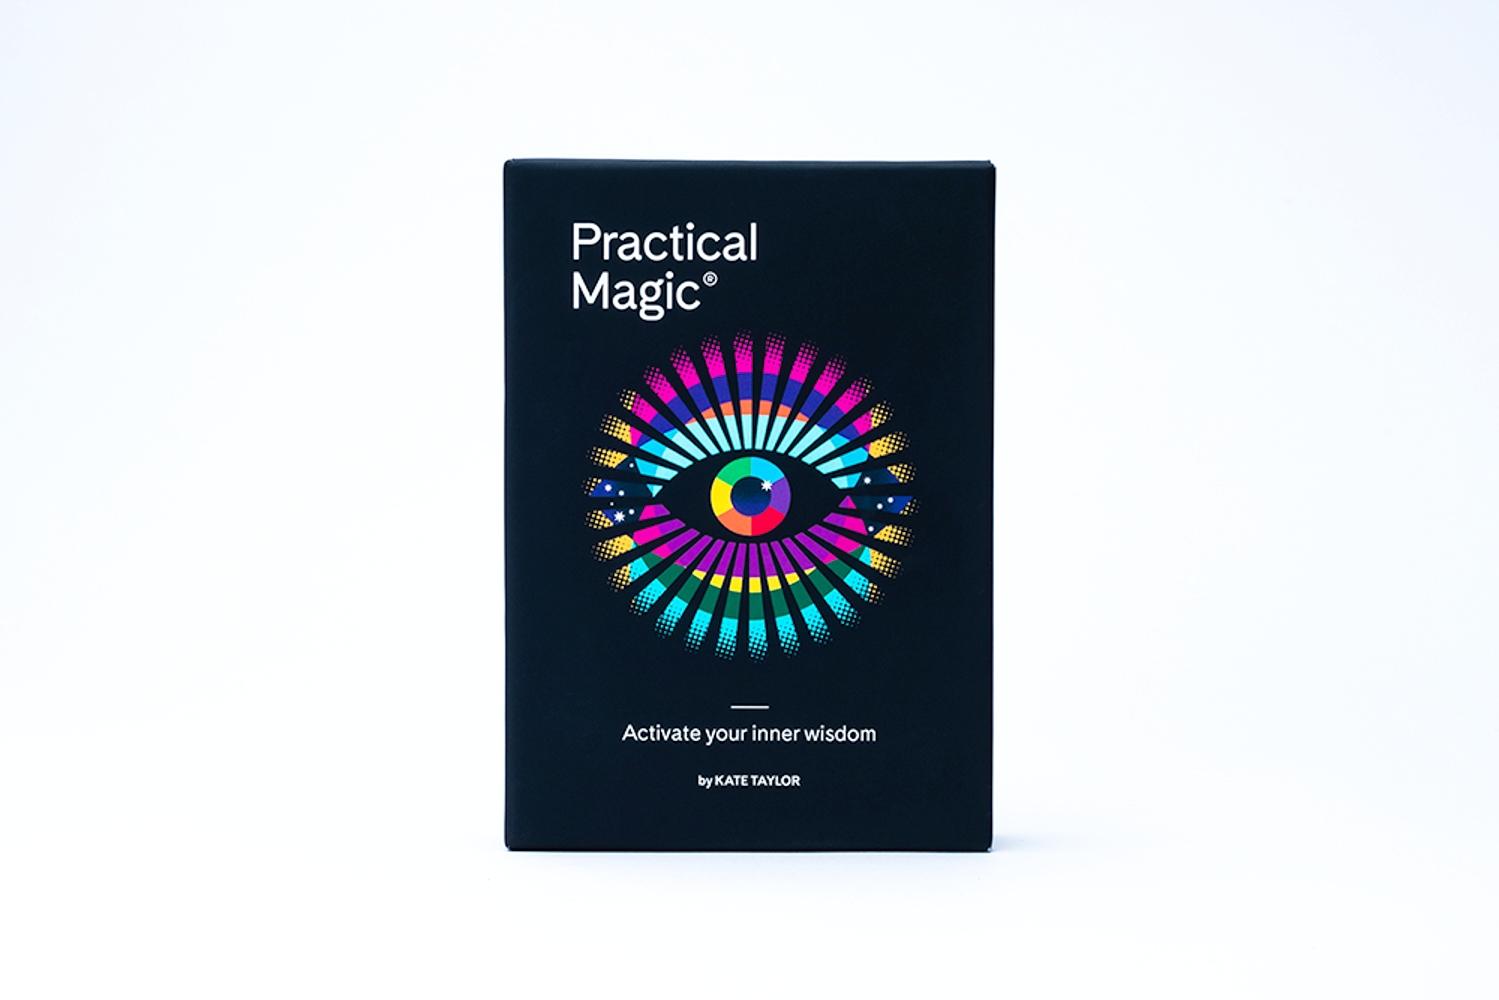 The practical magic activation deck u practical magic living